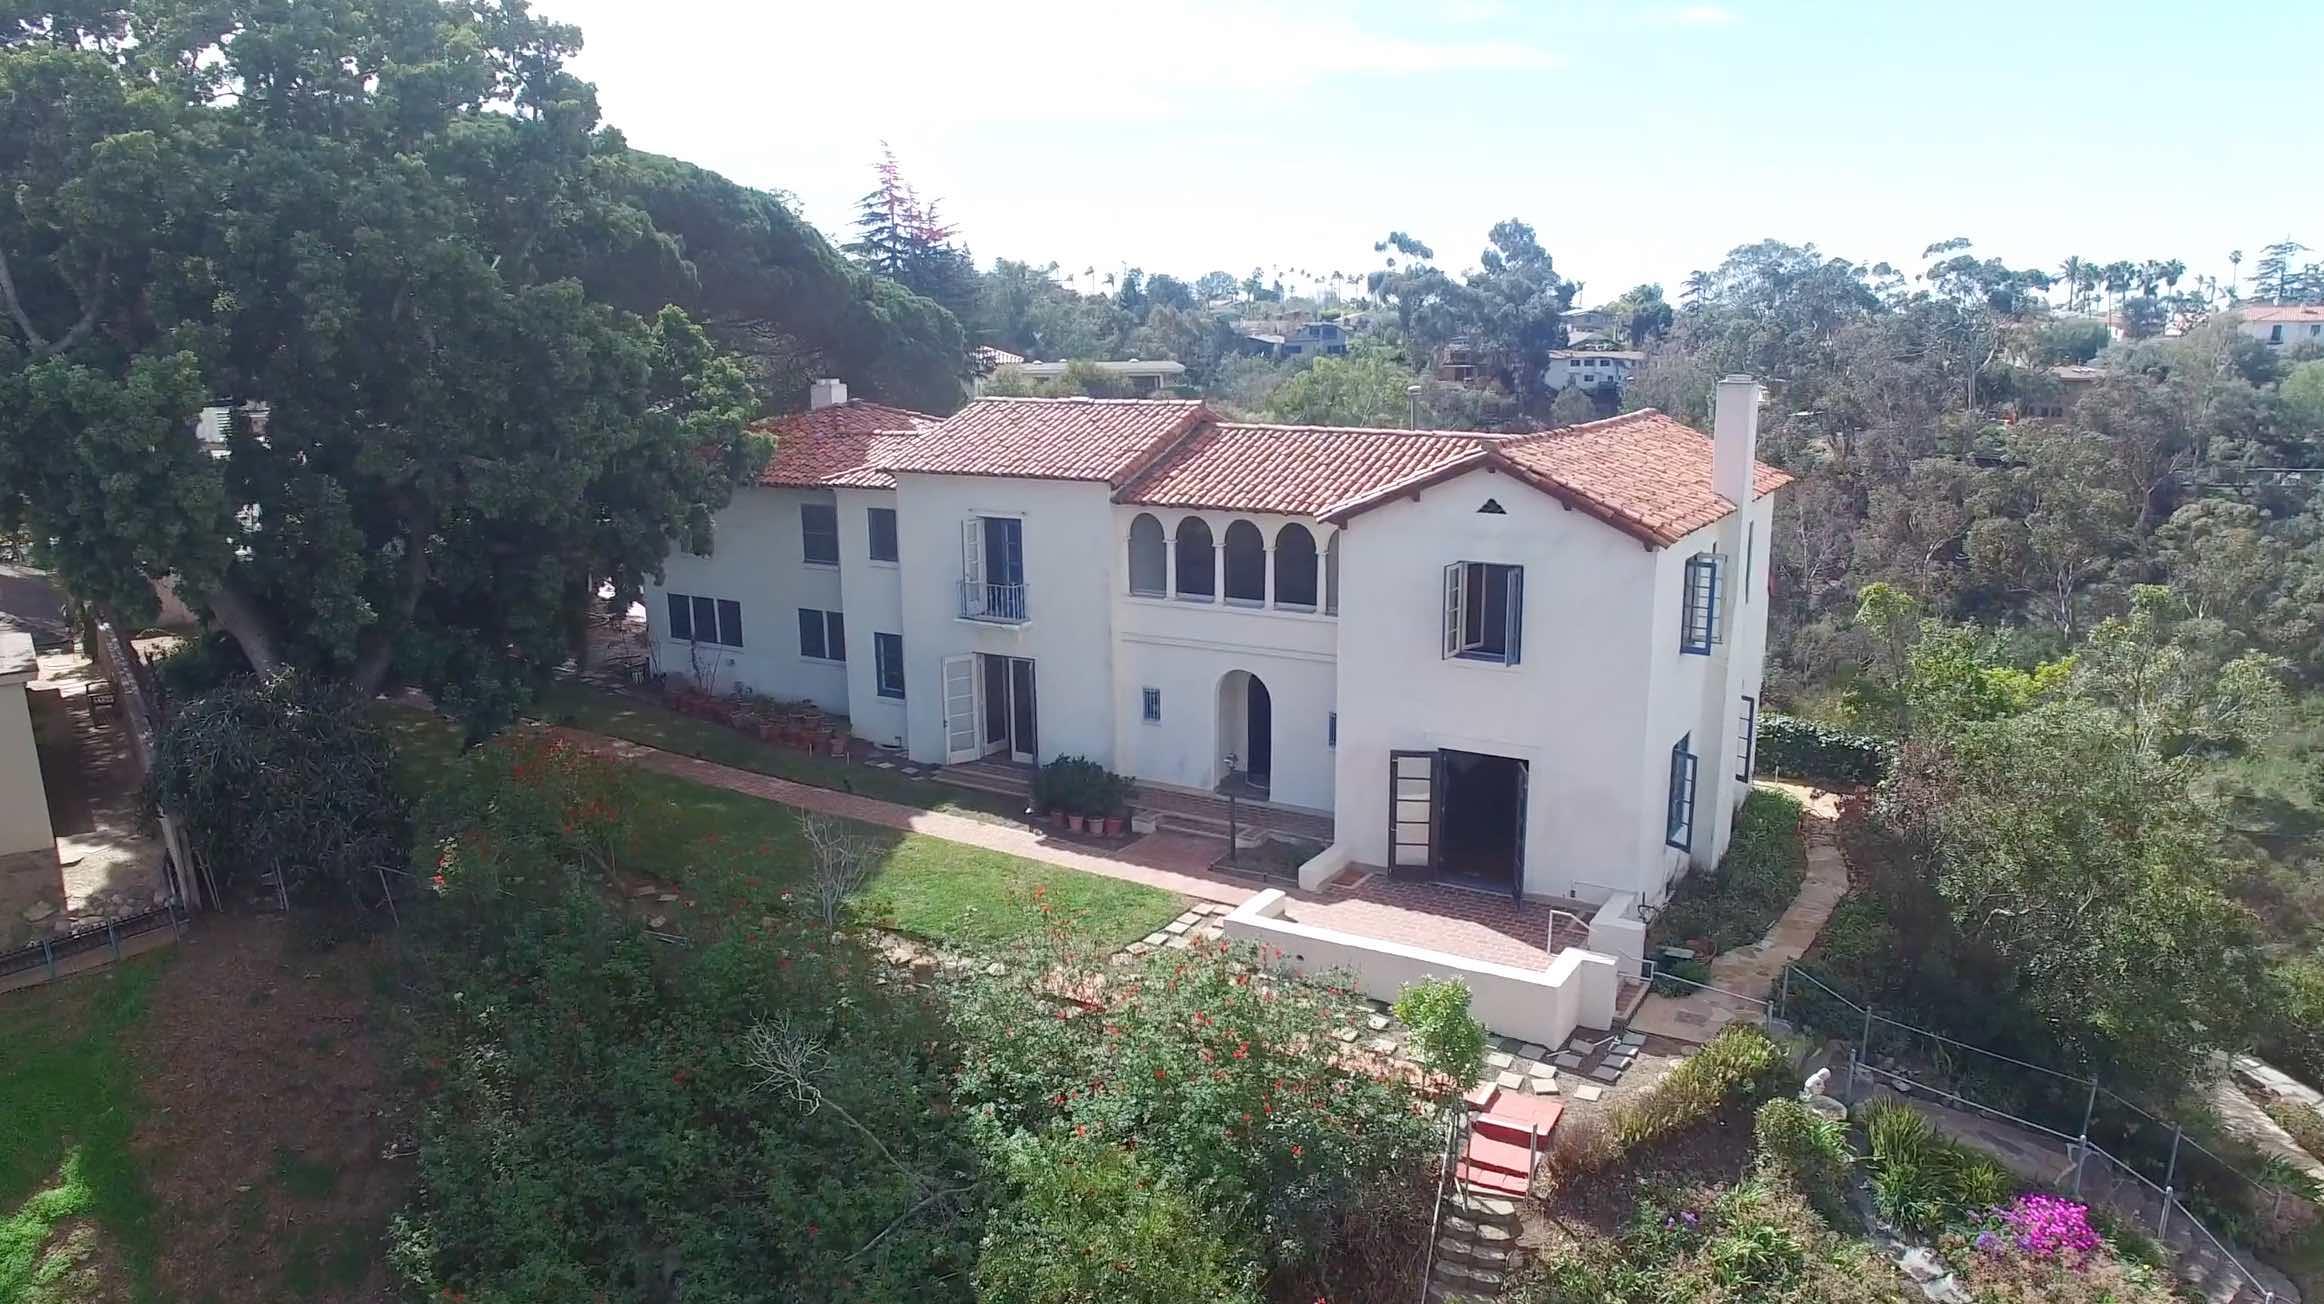 Villa-Hermosa-Aerial-8